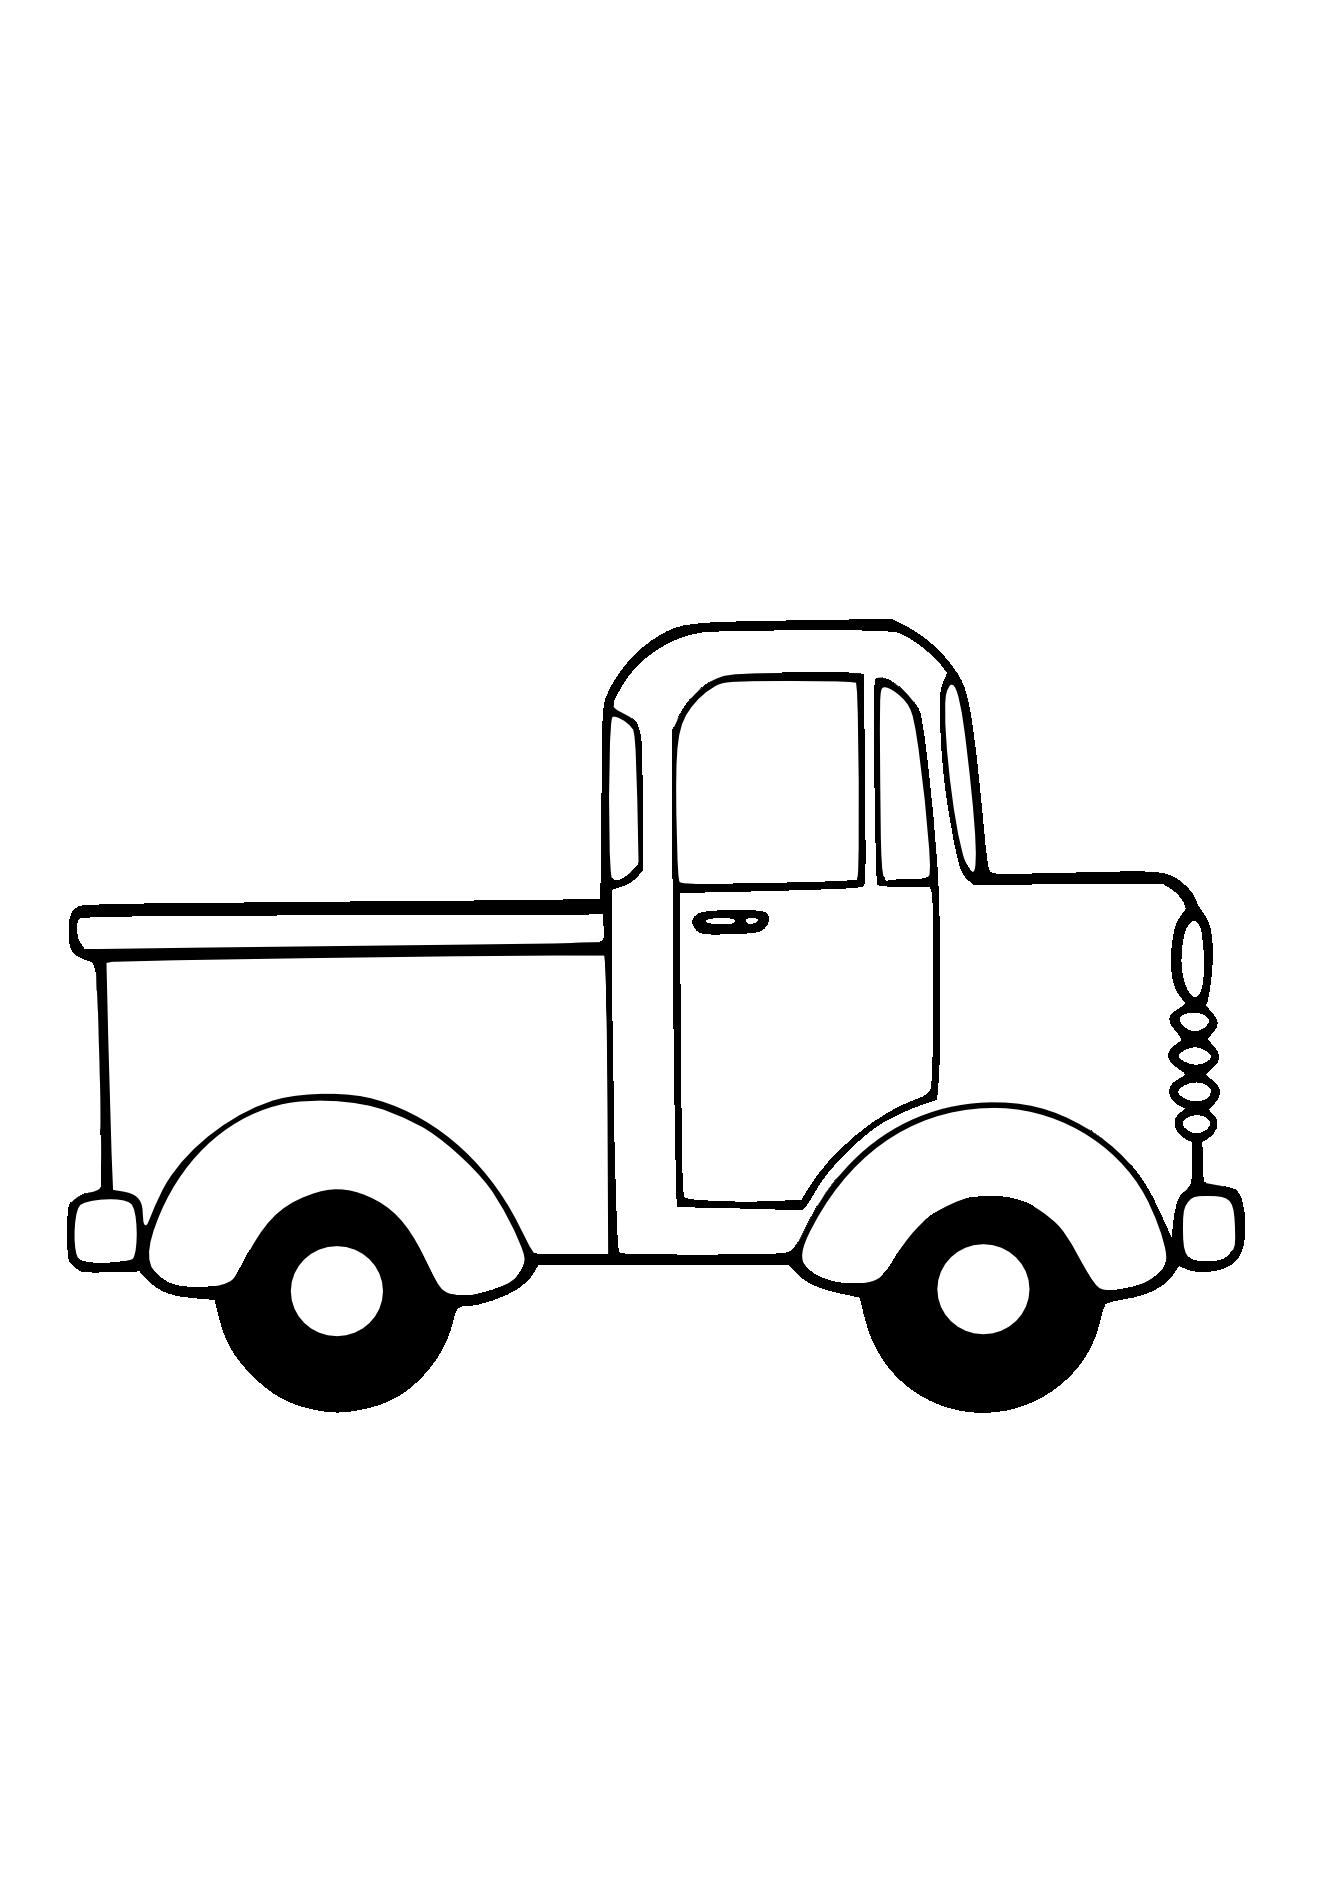 1331x1882 Truck Outline Clip Art